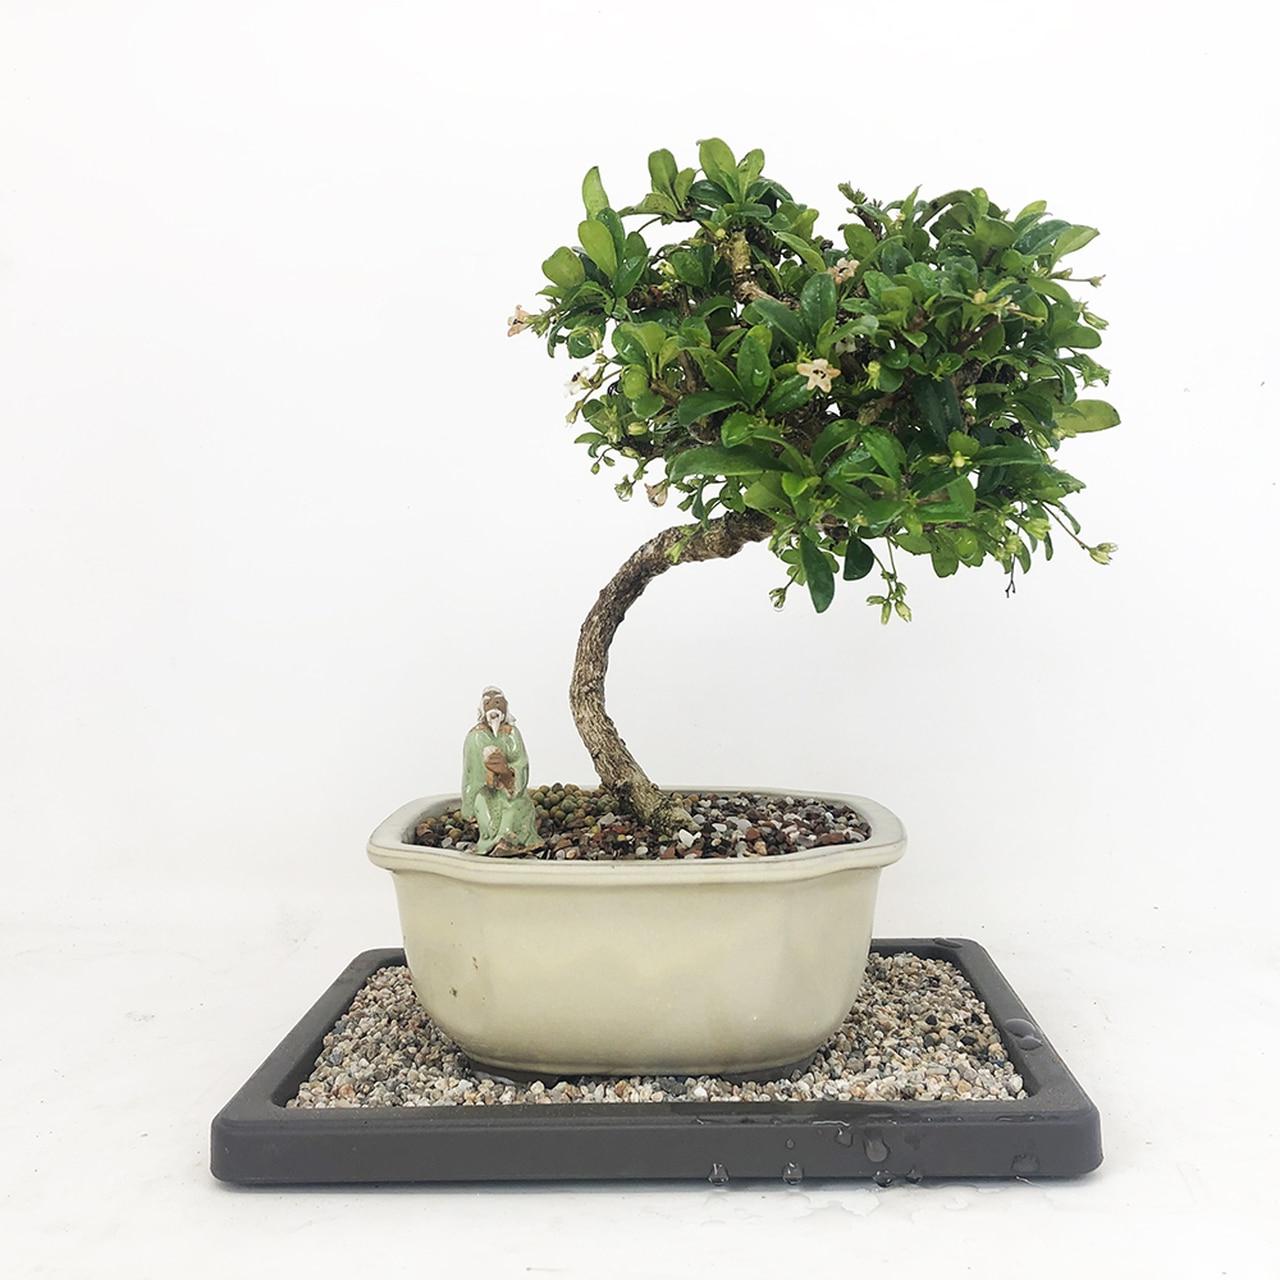 Most Current Carmona 6 Pot Indoor Houseplant Fukien Tea Bonsai Tree Inside Carmon Ceramic Garden Tool (View 24 of 30)